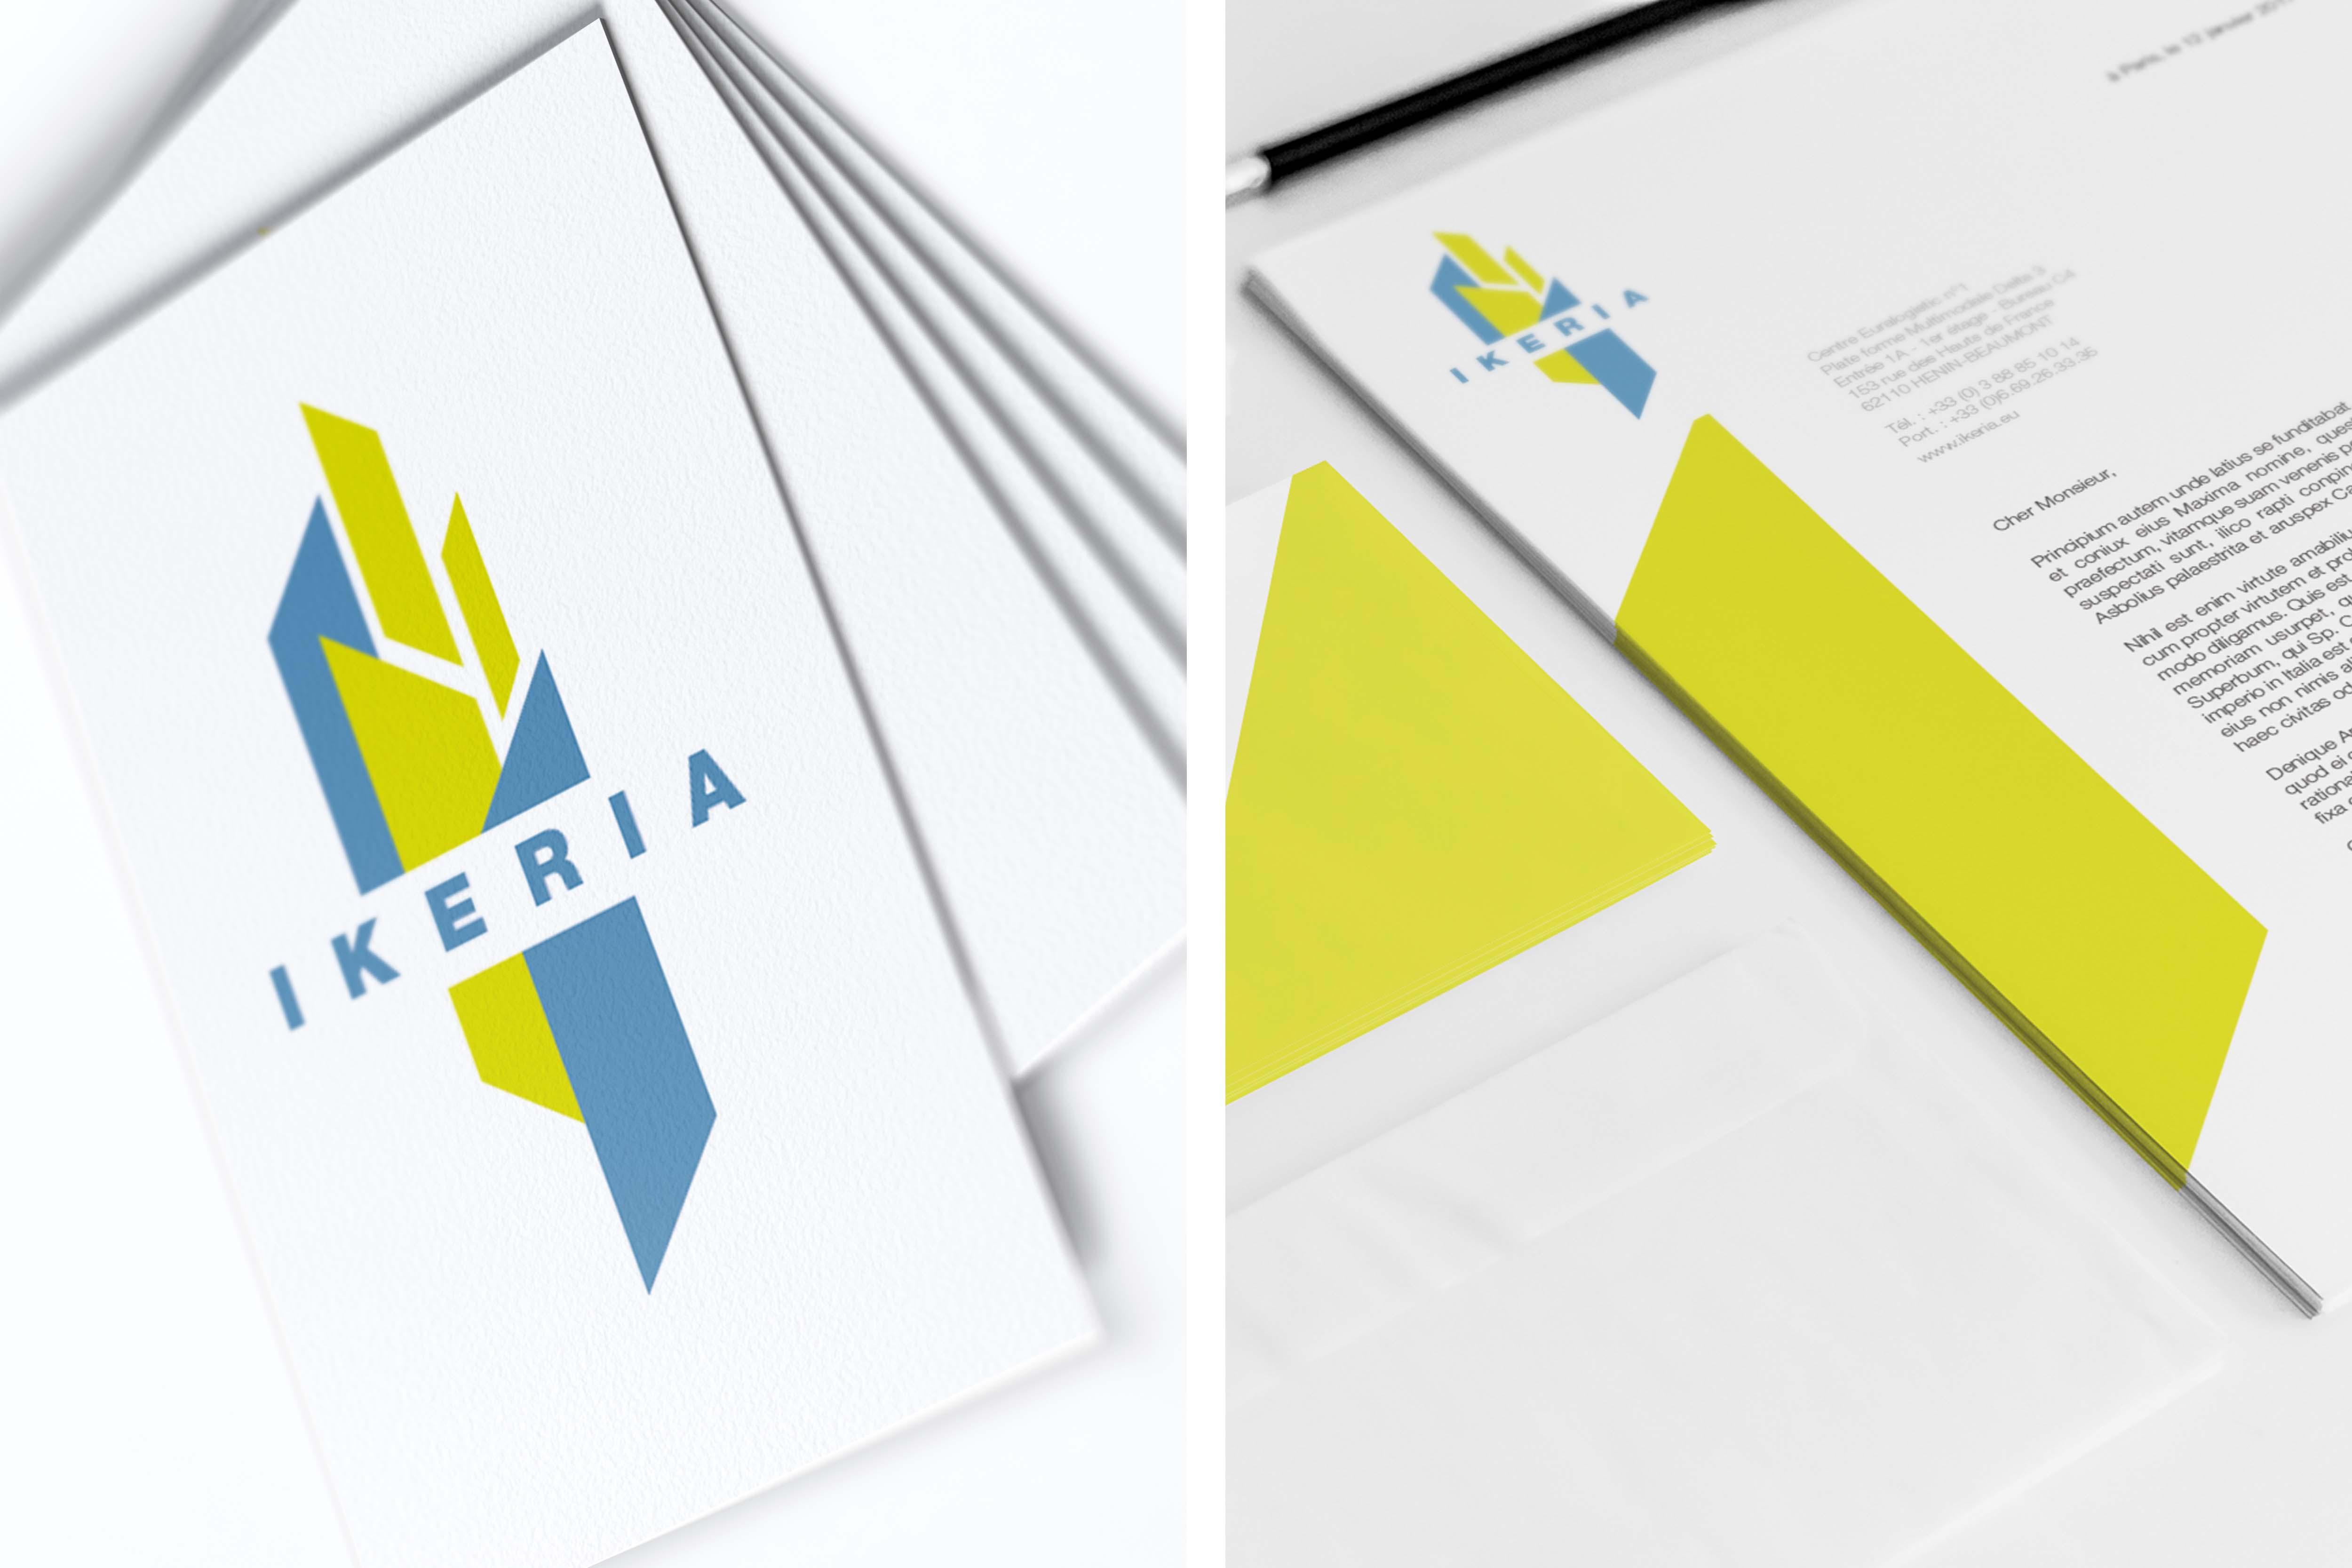 Ikeria